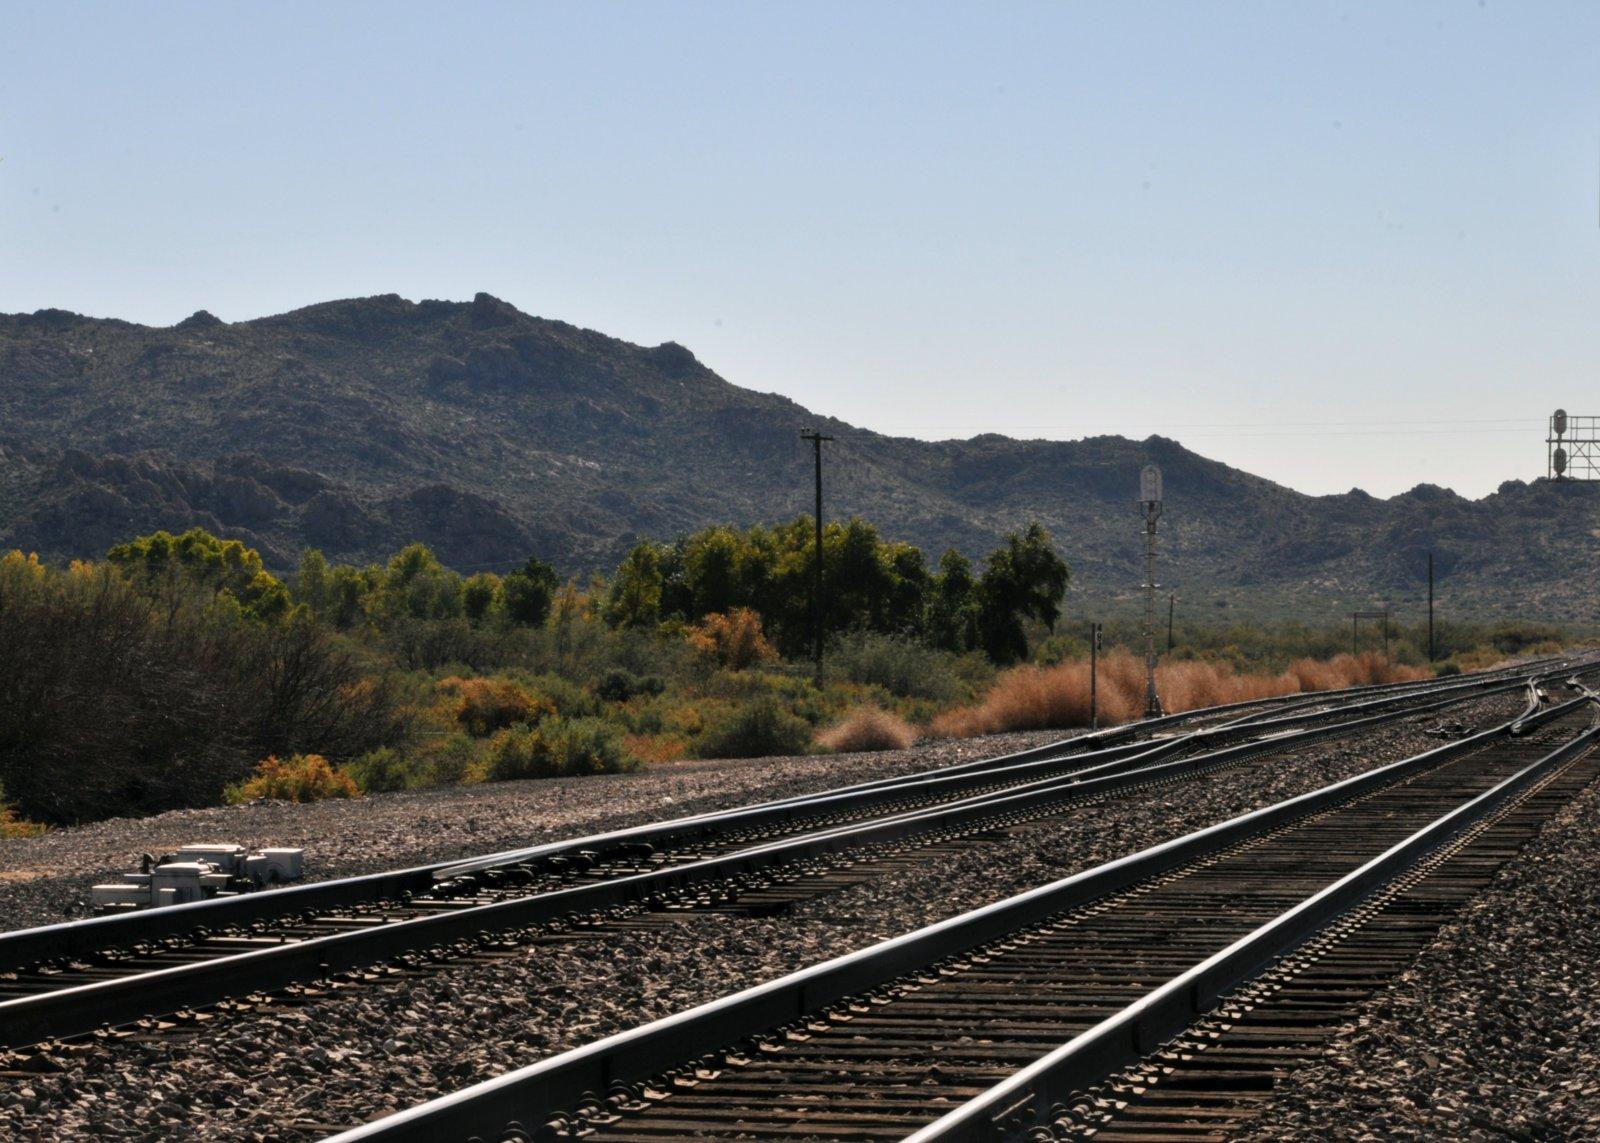 infinity-train-tracks.jpg